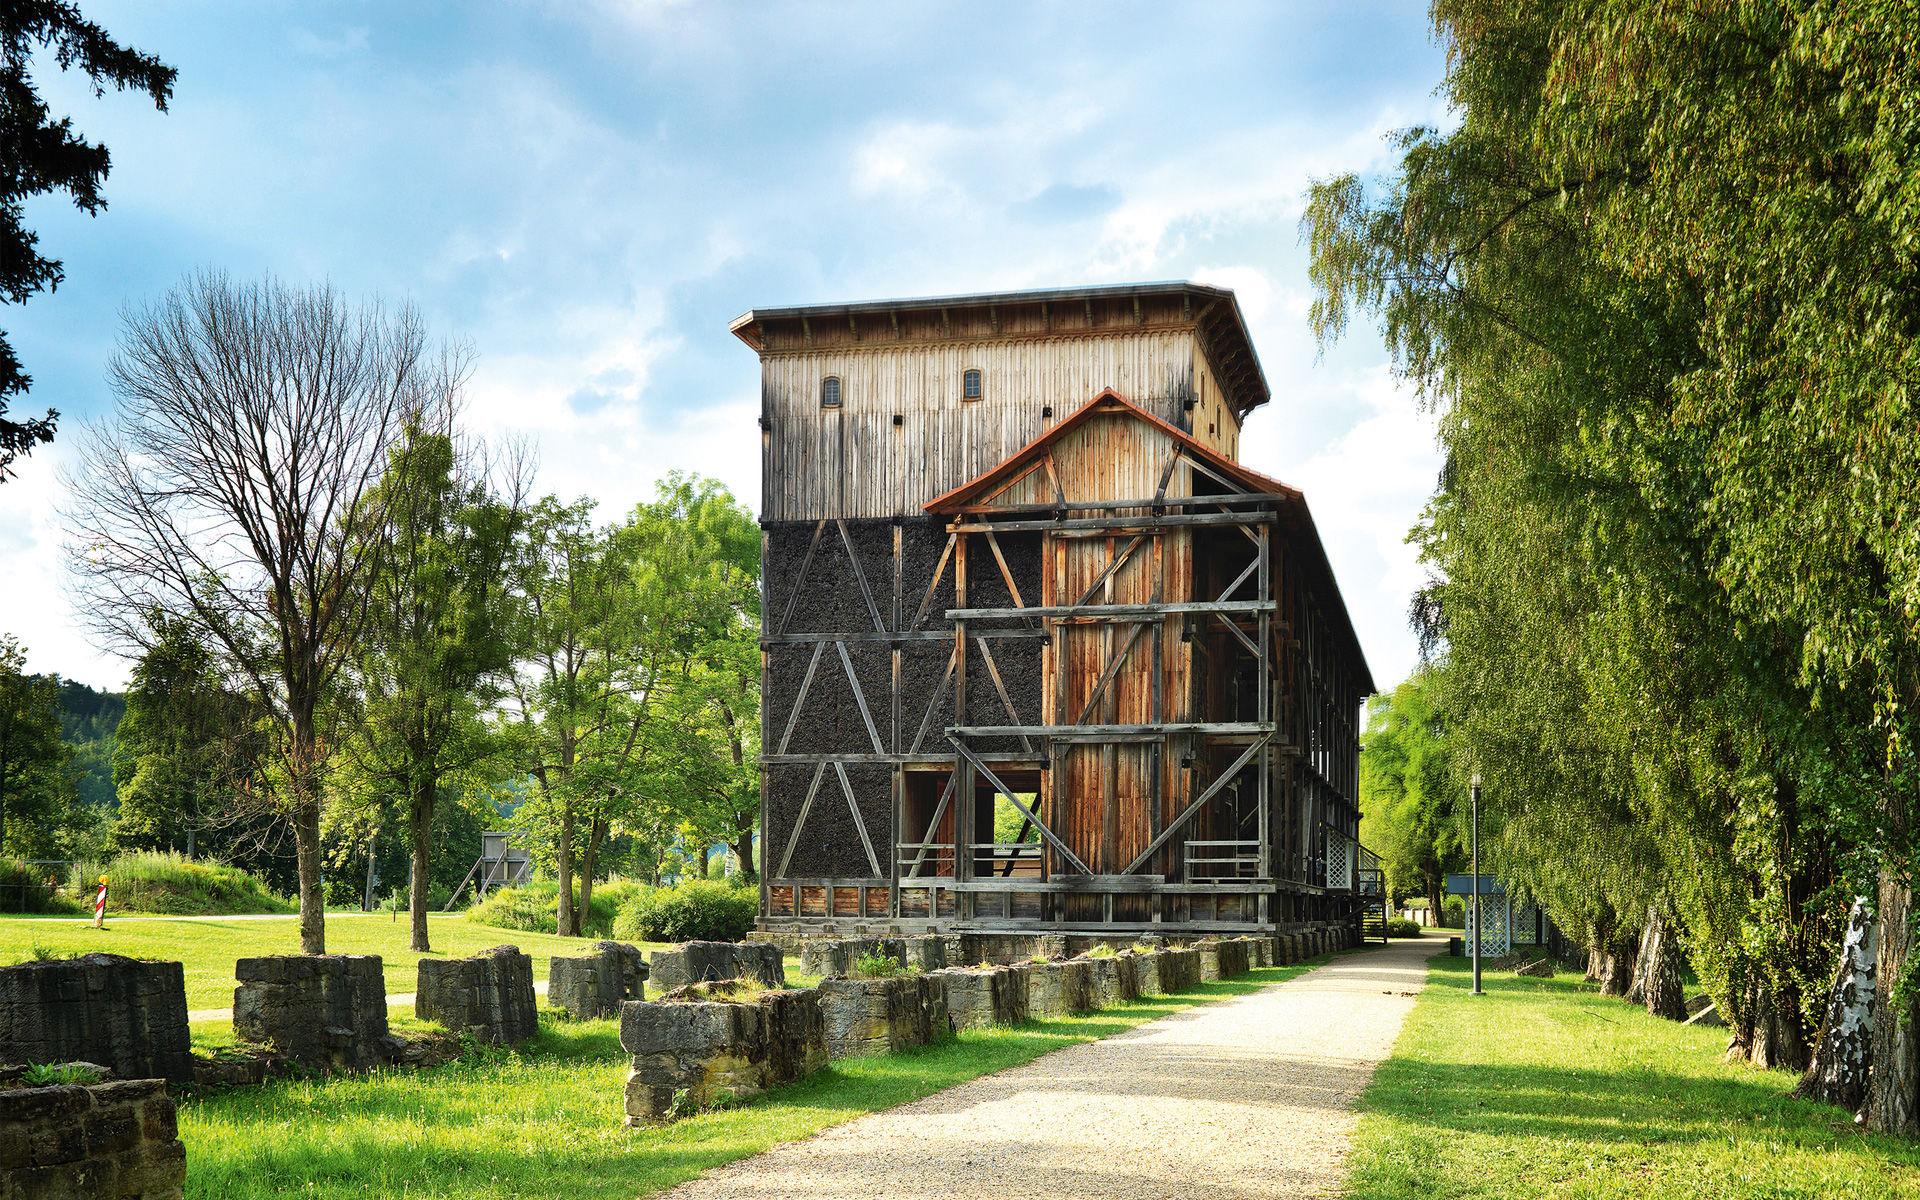 Foto des Gradierbaus in Bad Kissingen